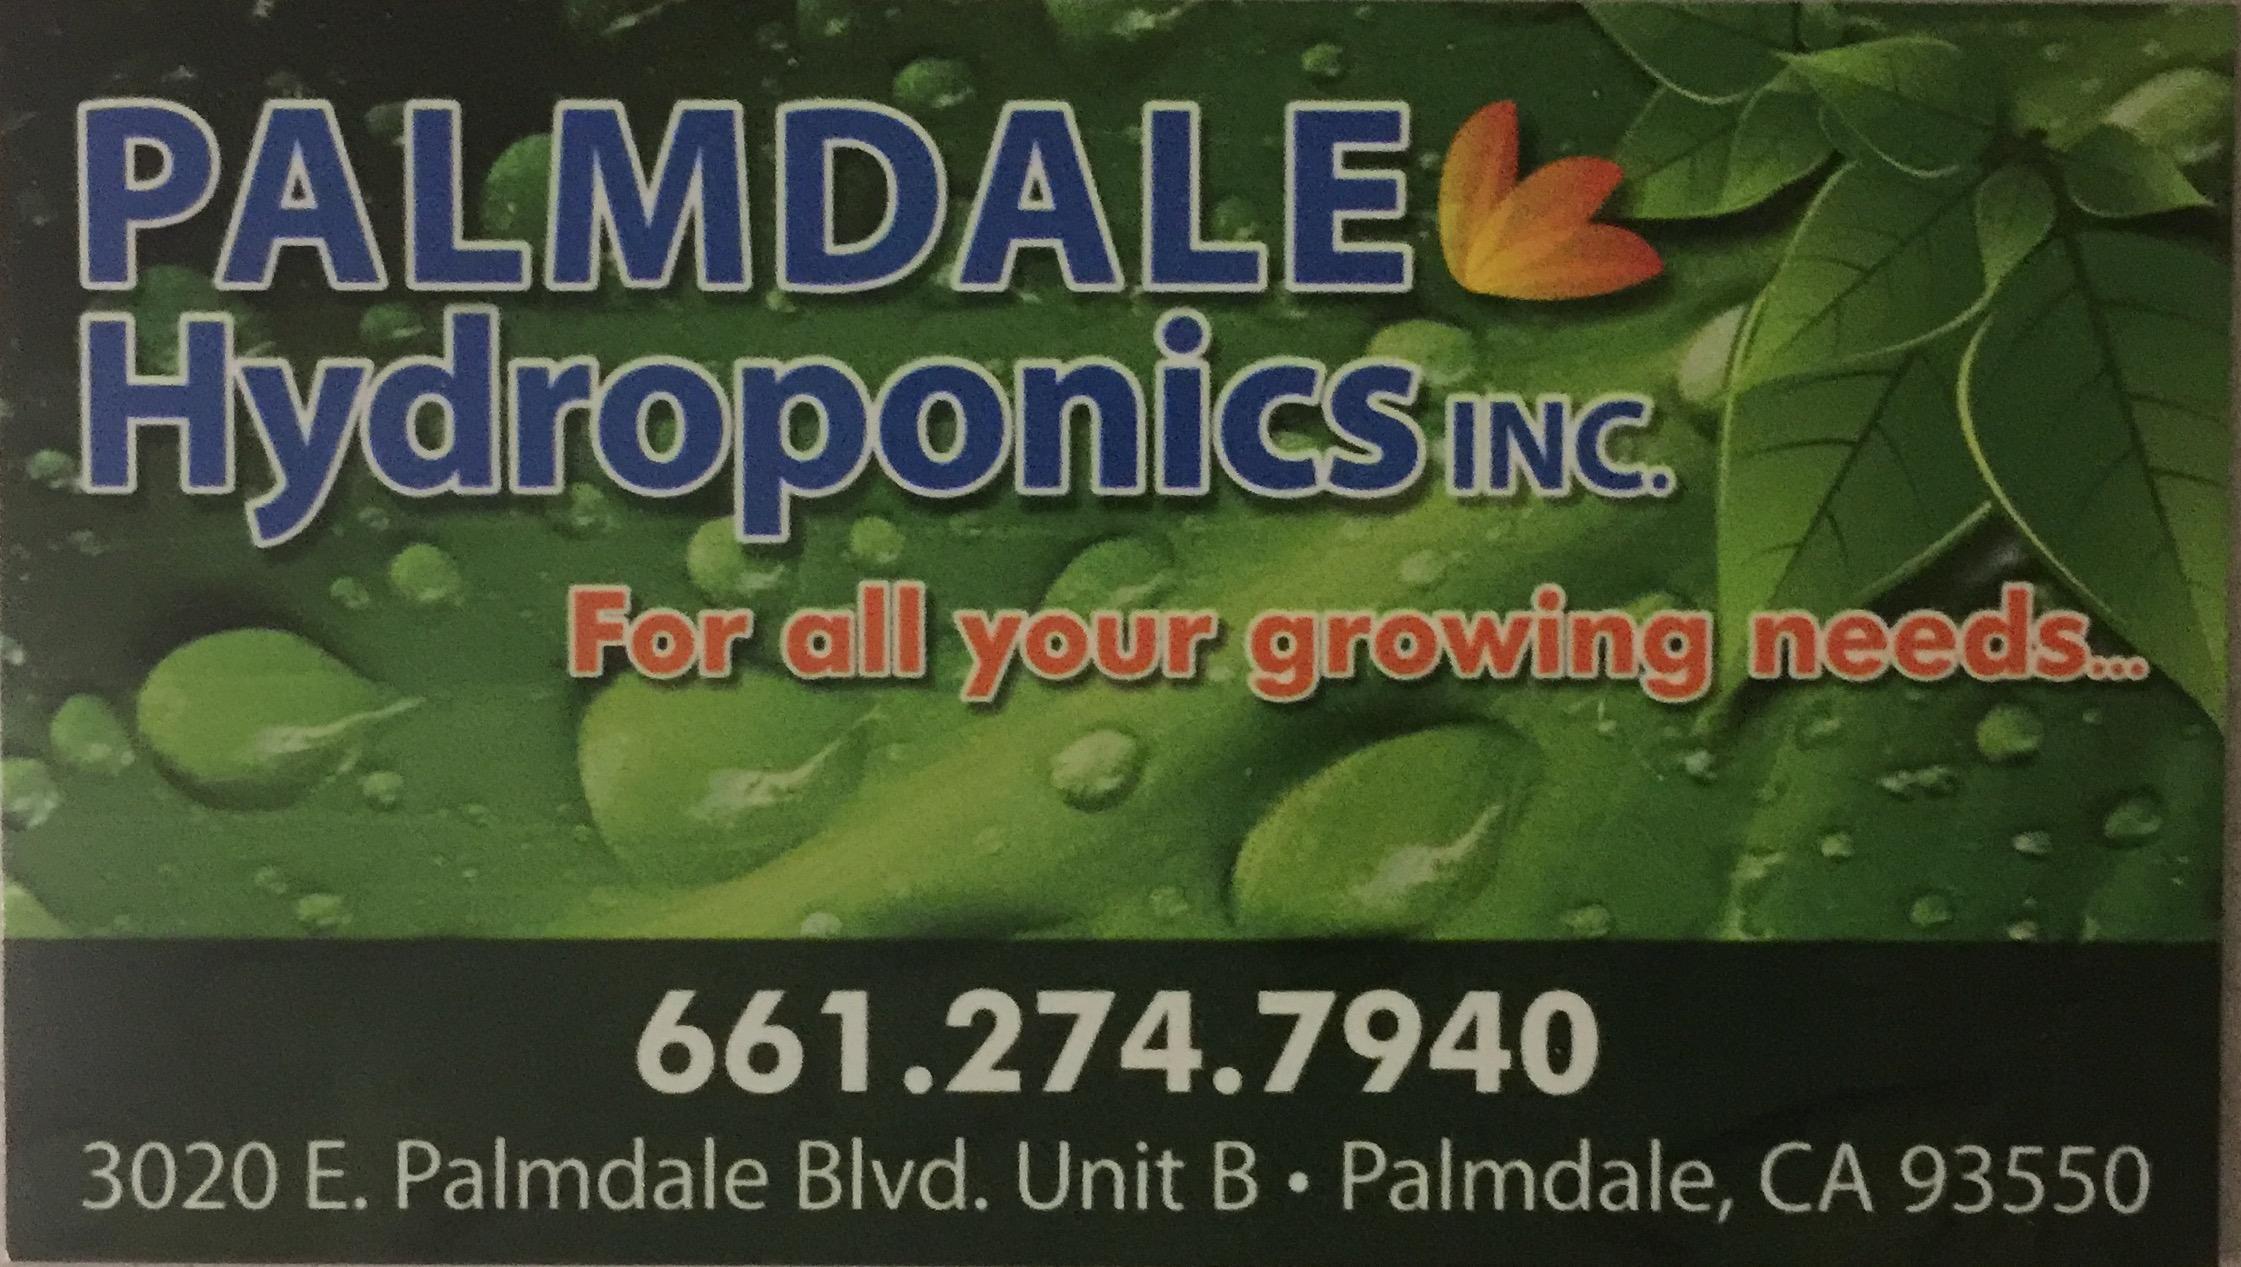 Palmdale Hydroponics Inc. image 1